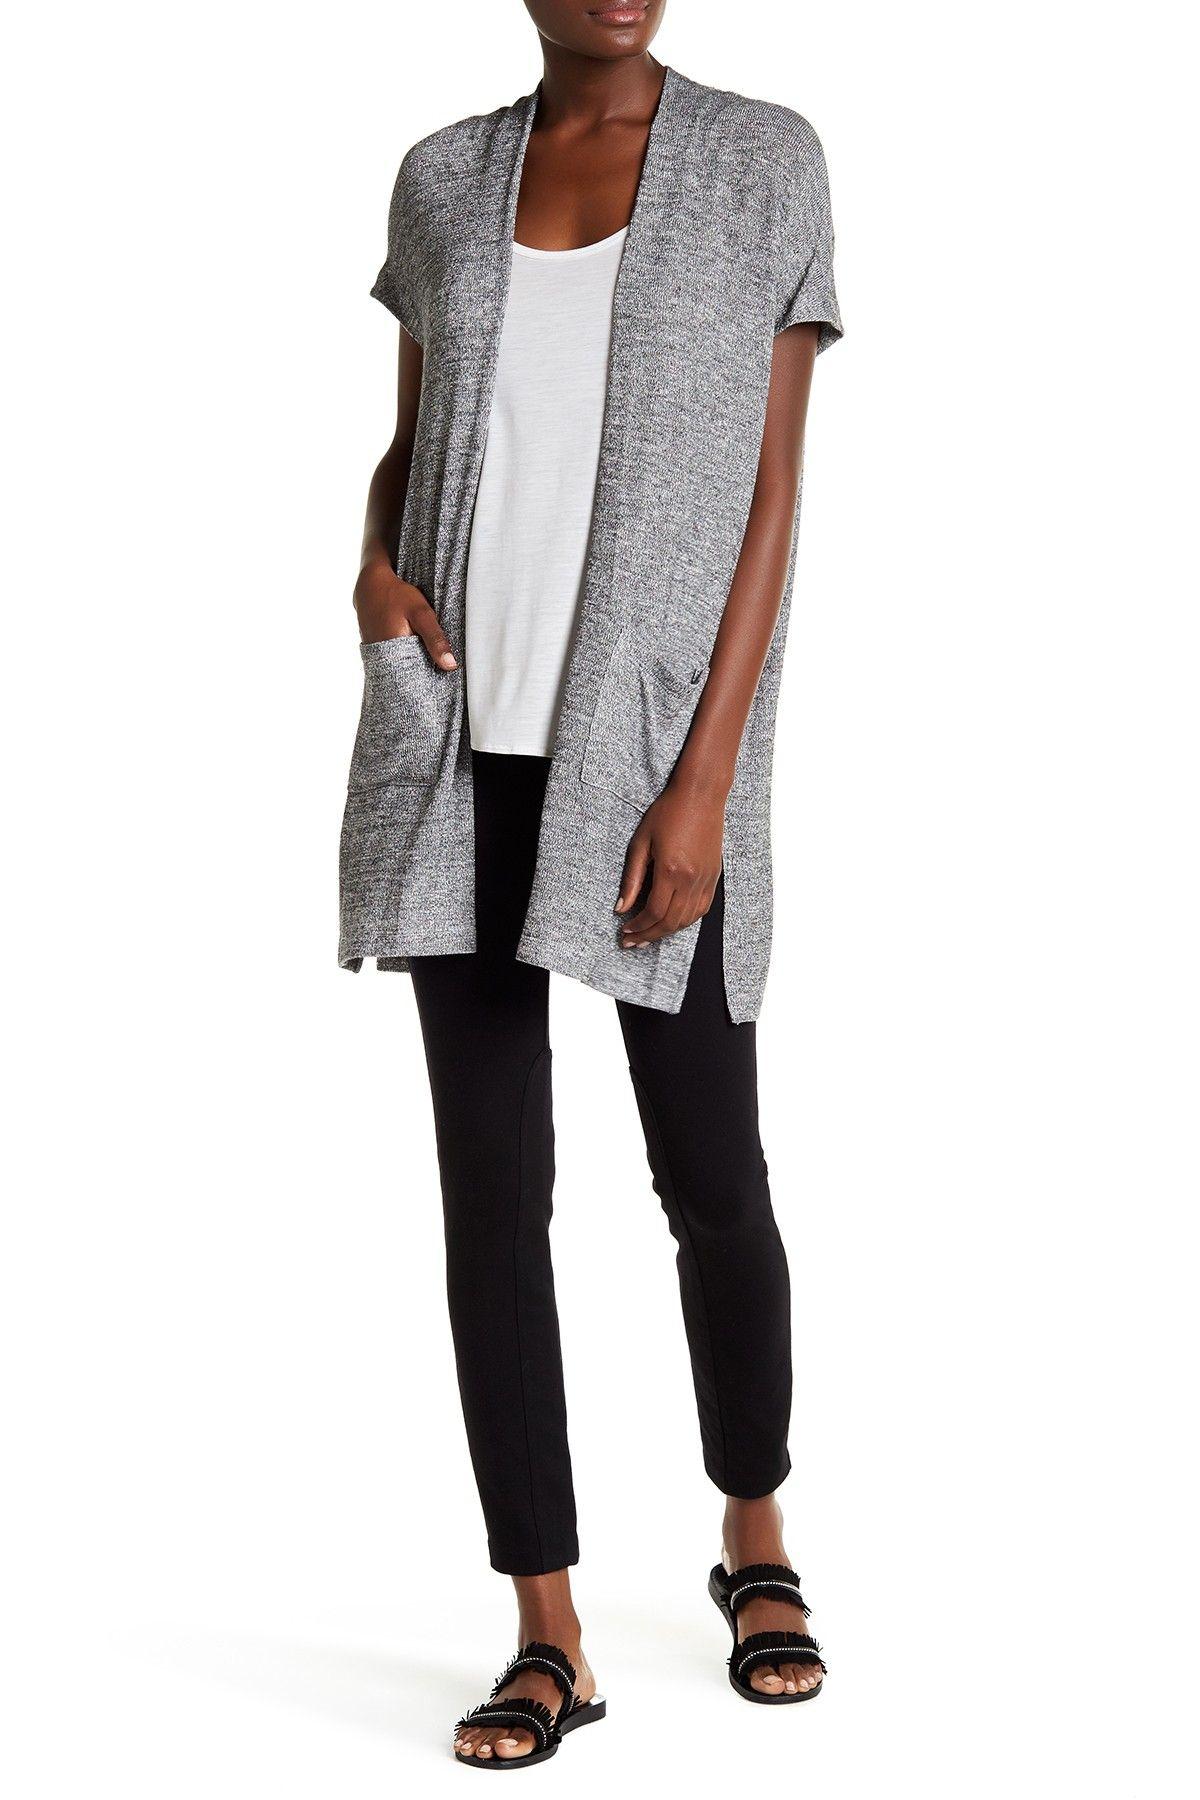 Metallic Short Sleeve Cardigan | Metallic shorts, Metallic and ...